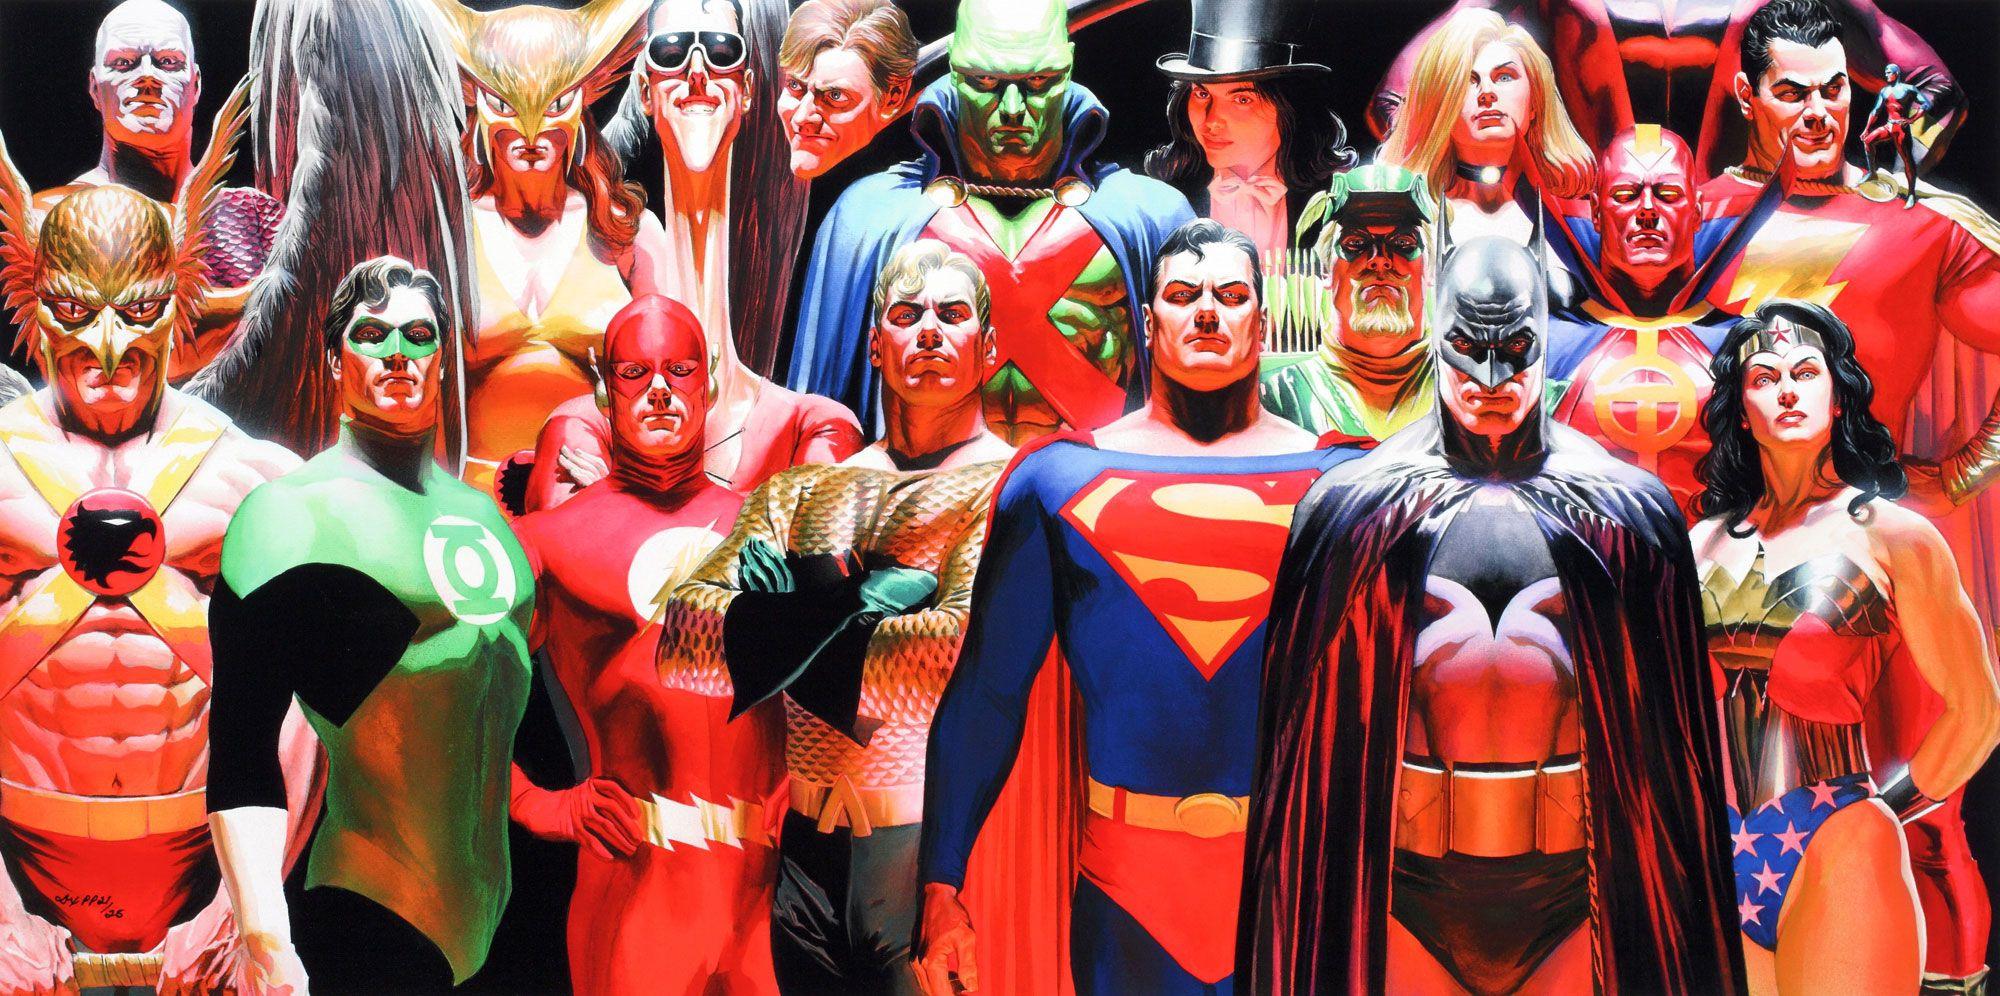 dc superhero wallpaper  Superheroes Wallpapers HD Group × DC Superheroes Wallpapers | HD ...